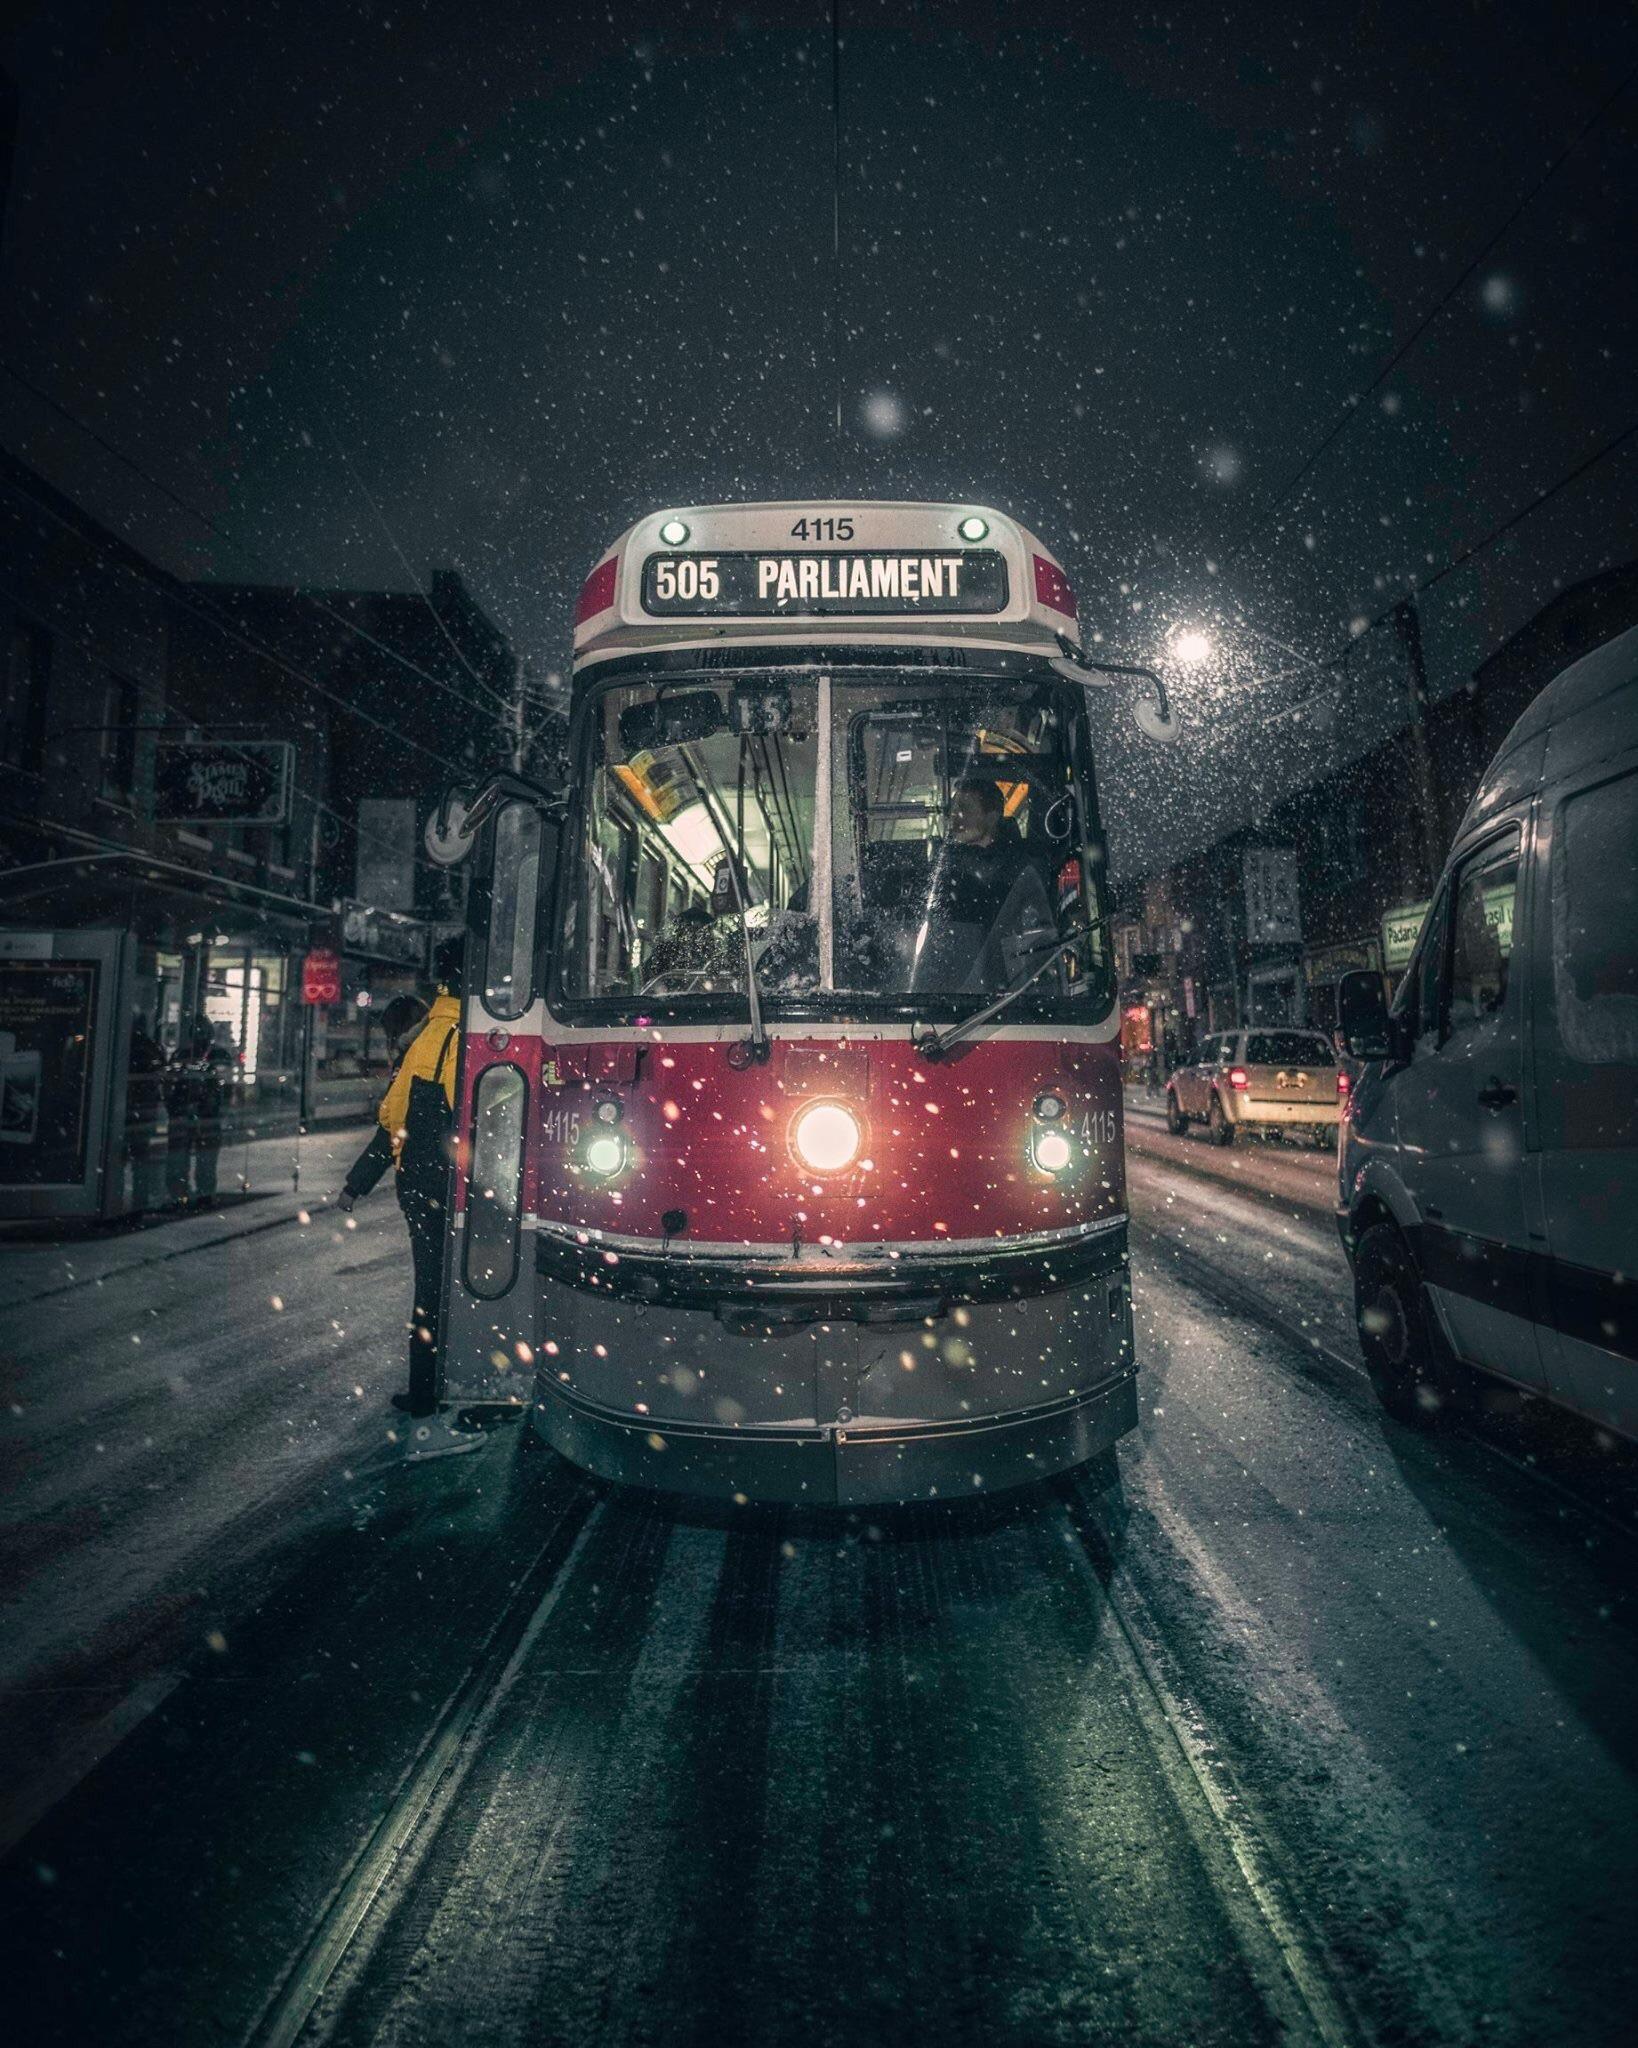 Itap Of A Toronto Streetcar On A Snowy Night Toronto Night Movie Wallpapers Toronto tram vehicle city night lights